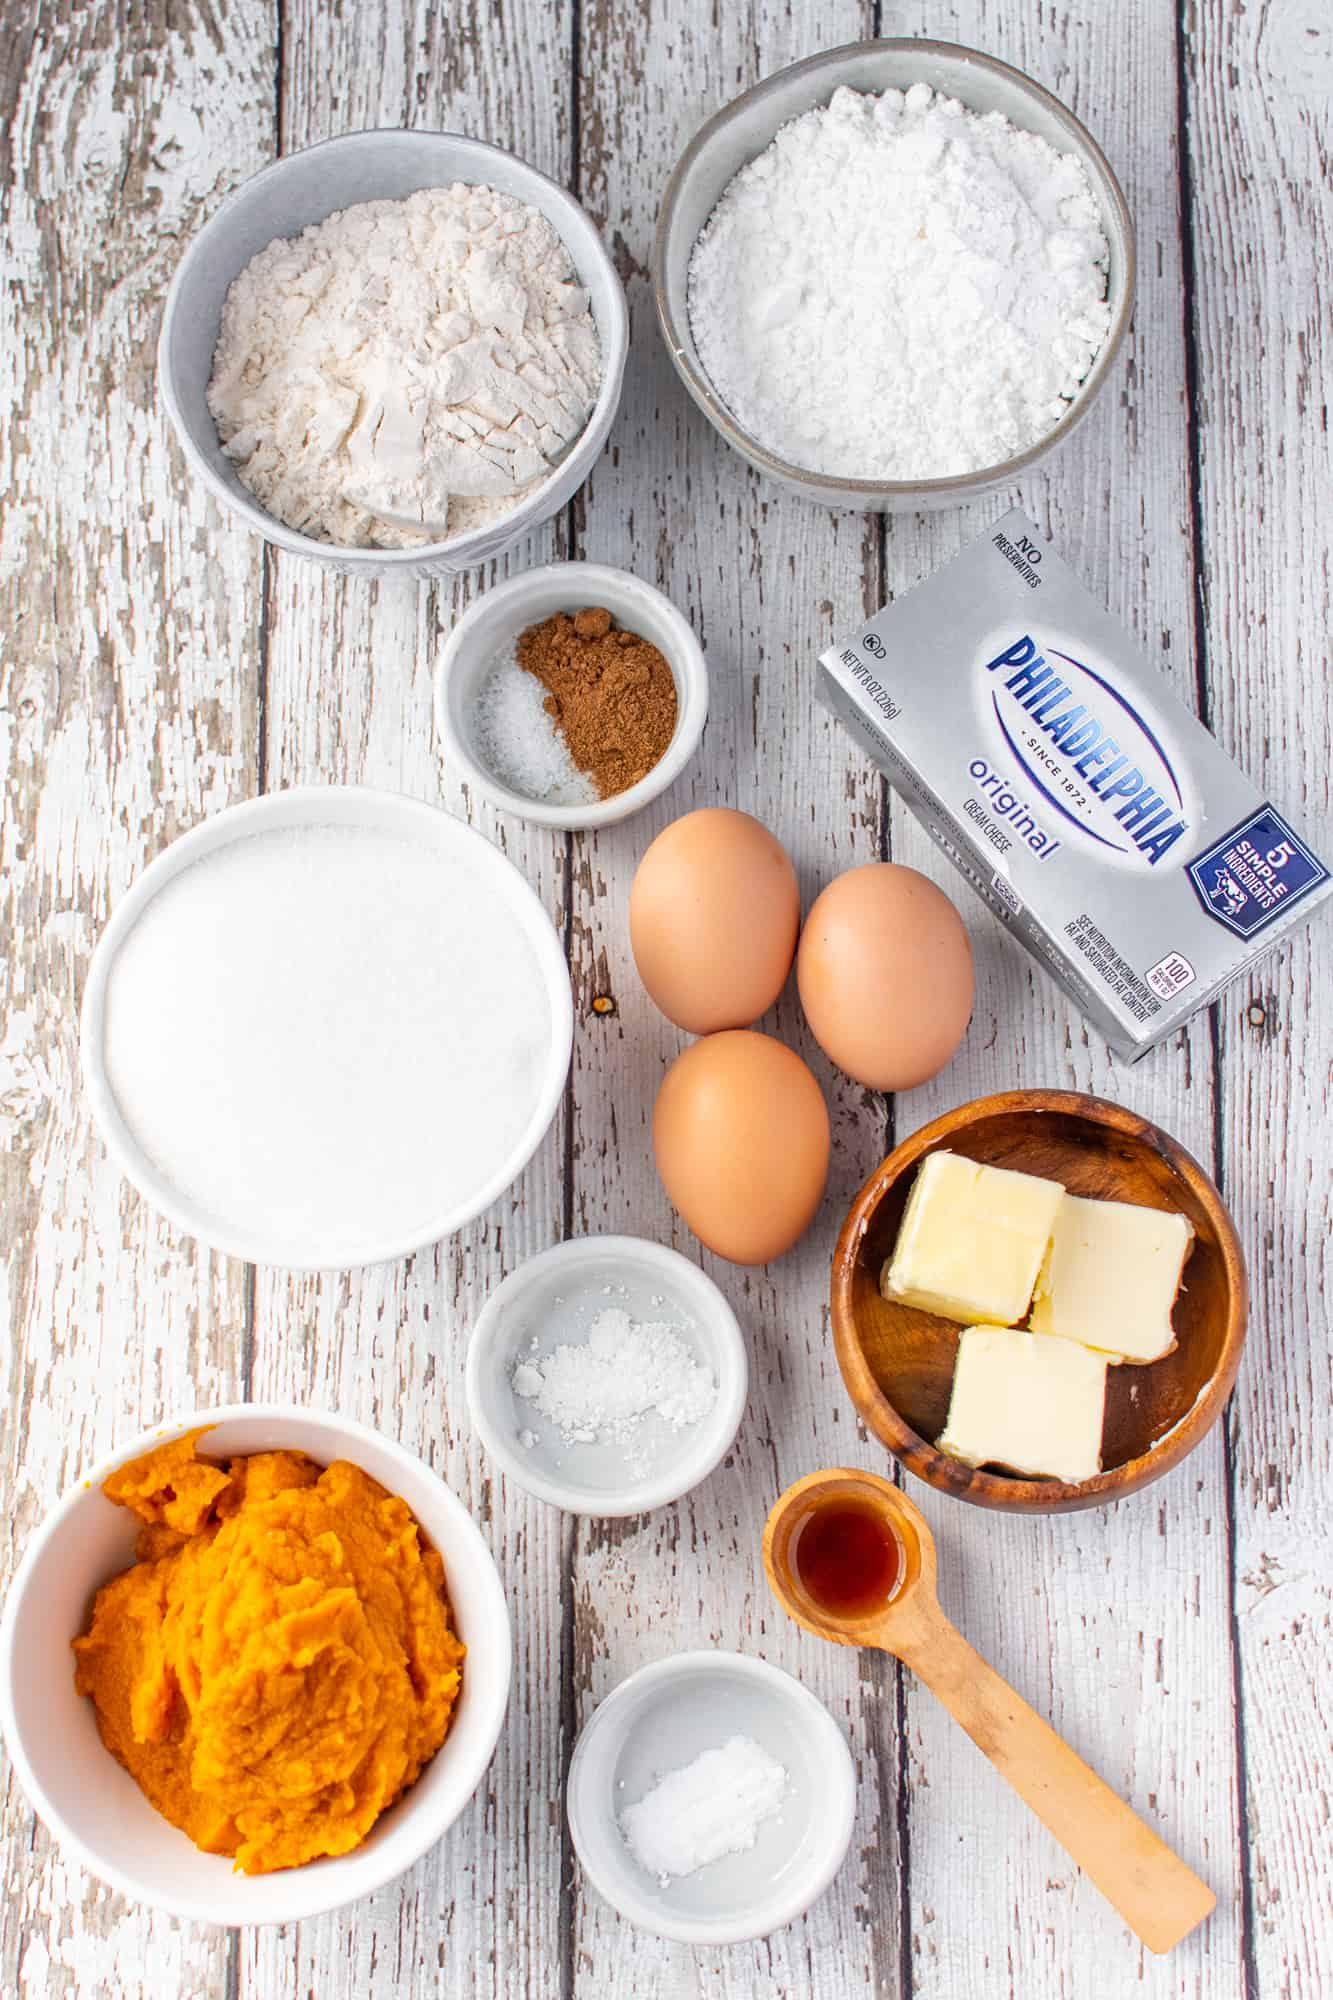 all-purpose flour, baking powder, baking soda, PUMPKIN PIE SPICE, large eggs, white sugar, PURE pumpkin, cream cheese, powdered sugar, butter, vanilla extract.